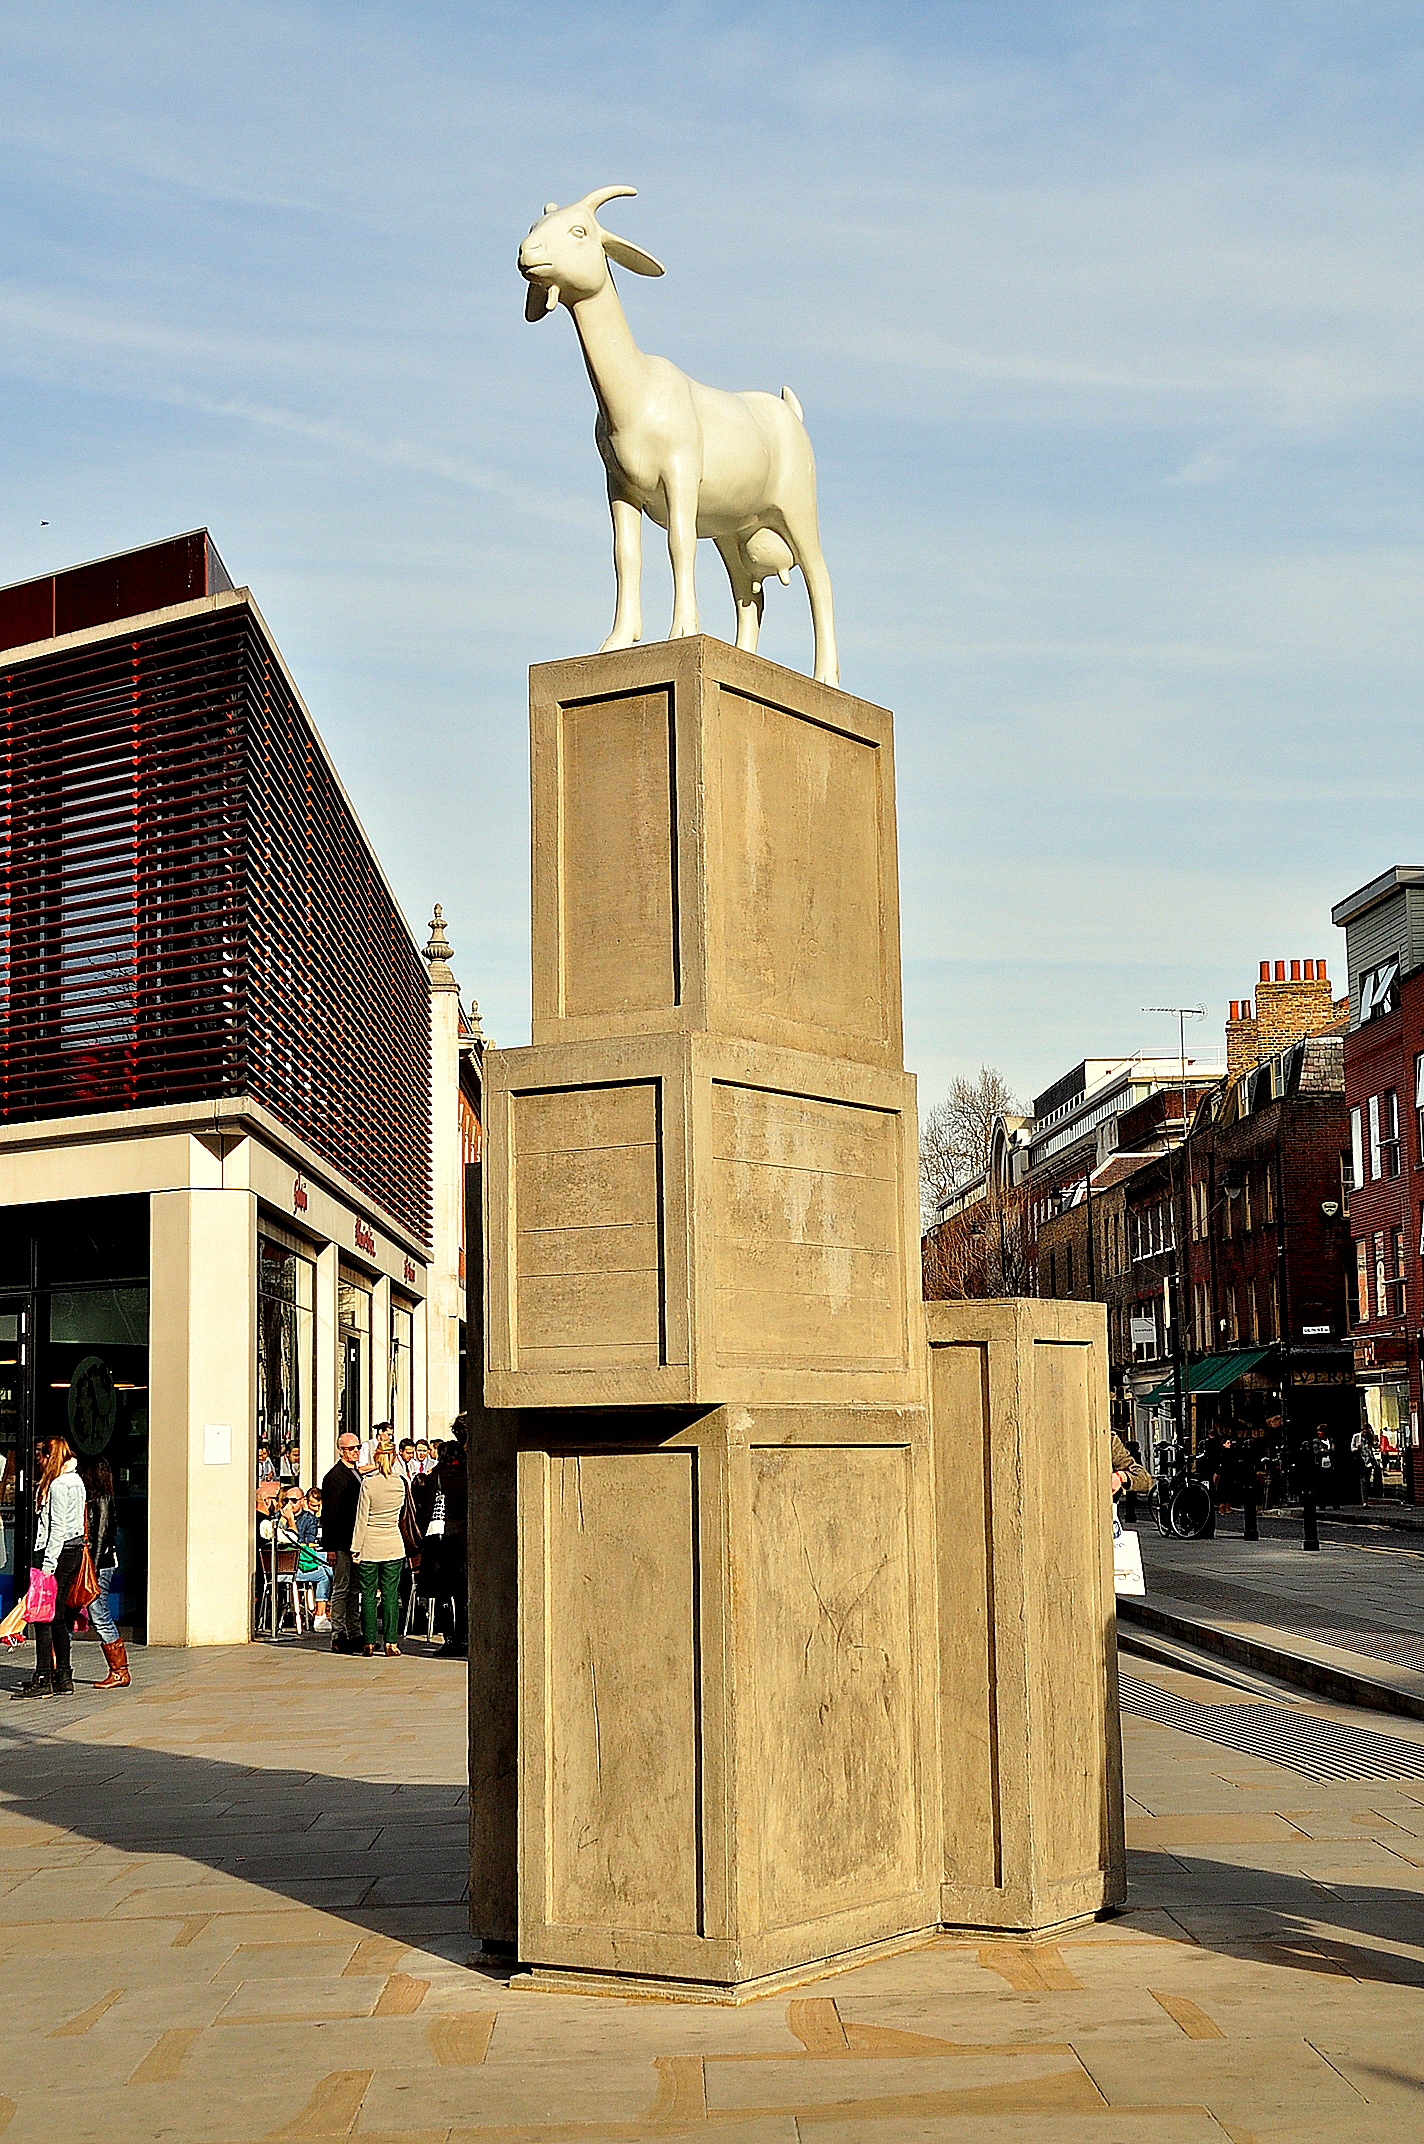 Spitalfields London: File:I Goat Sculpture, Spitalfields, London.JPG